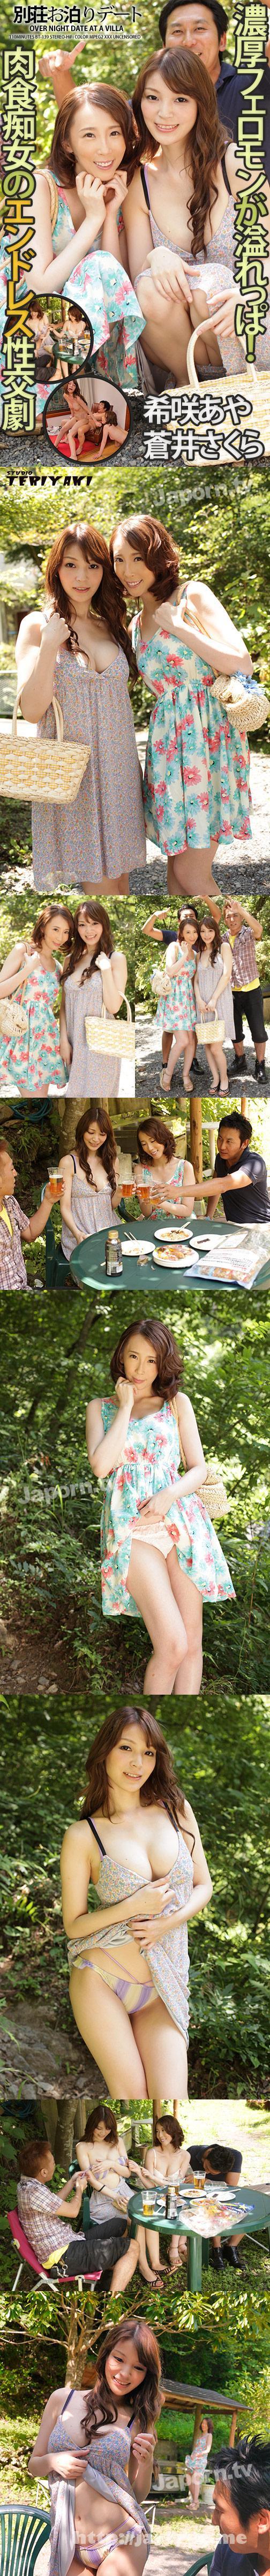 [BT 139] 別荘お泊まりデート : 希咲あや, 蒼井さくら 蒼井さくら 希咲あや Sakura Aoi BT Aya Kisaki